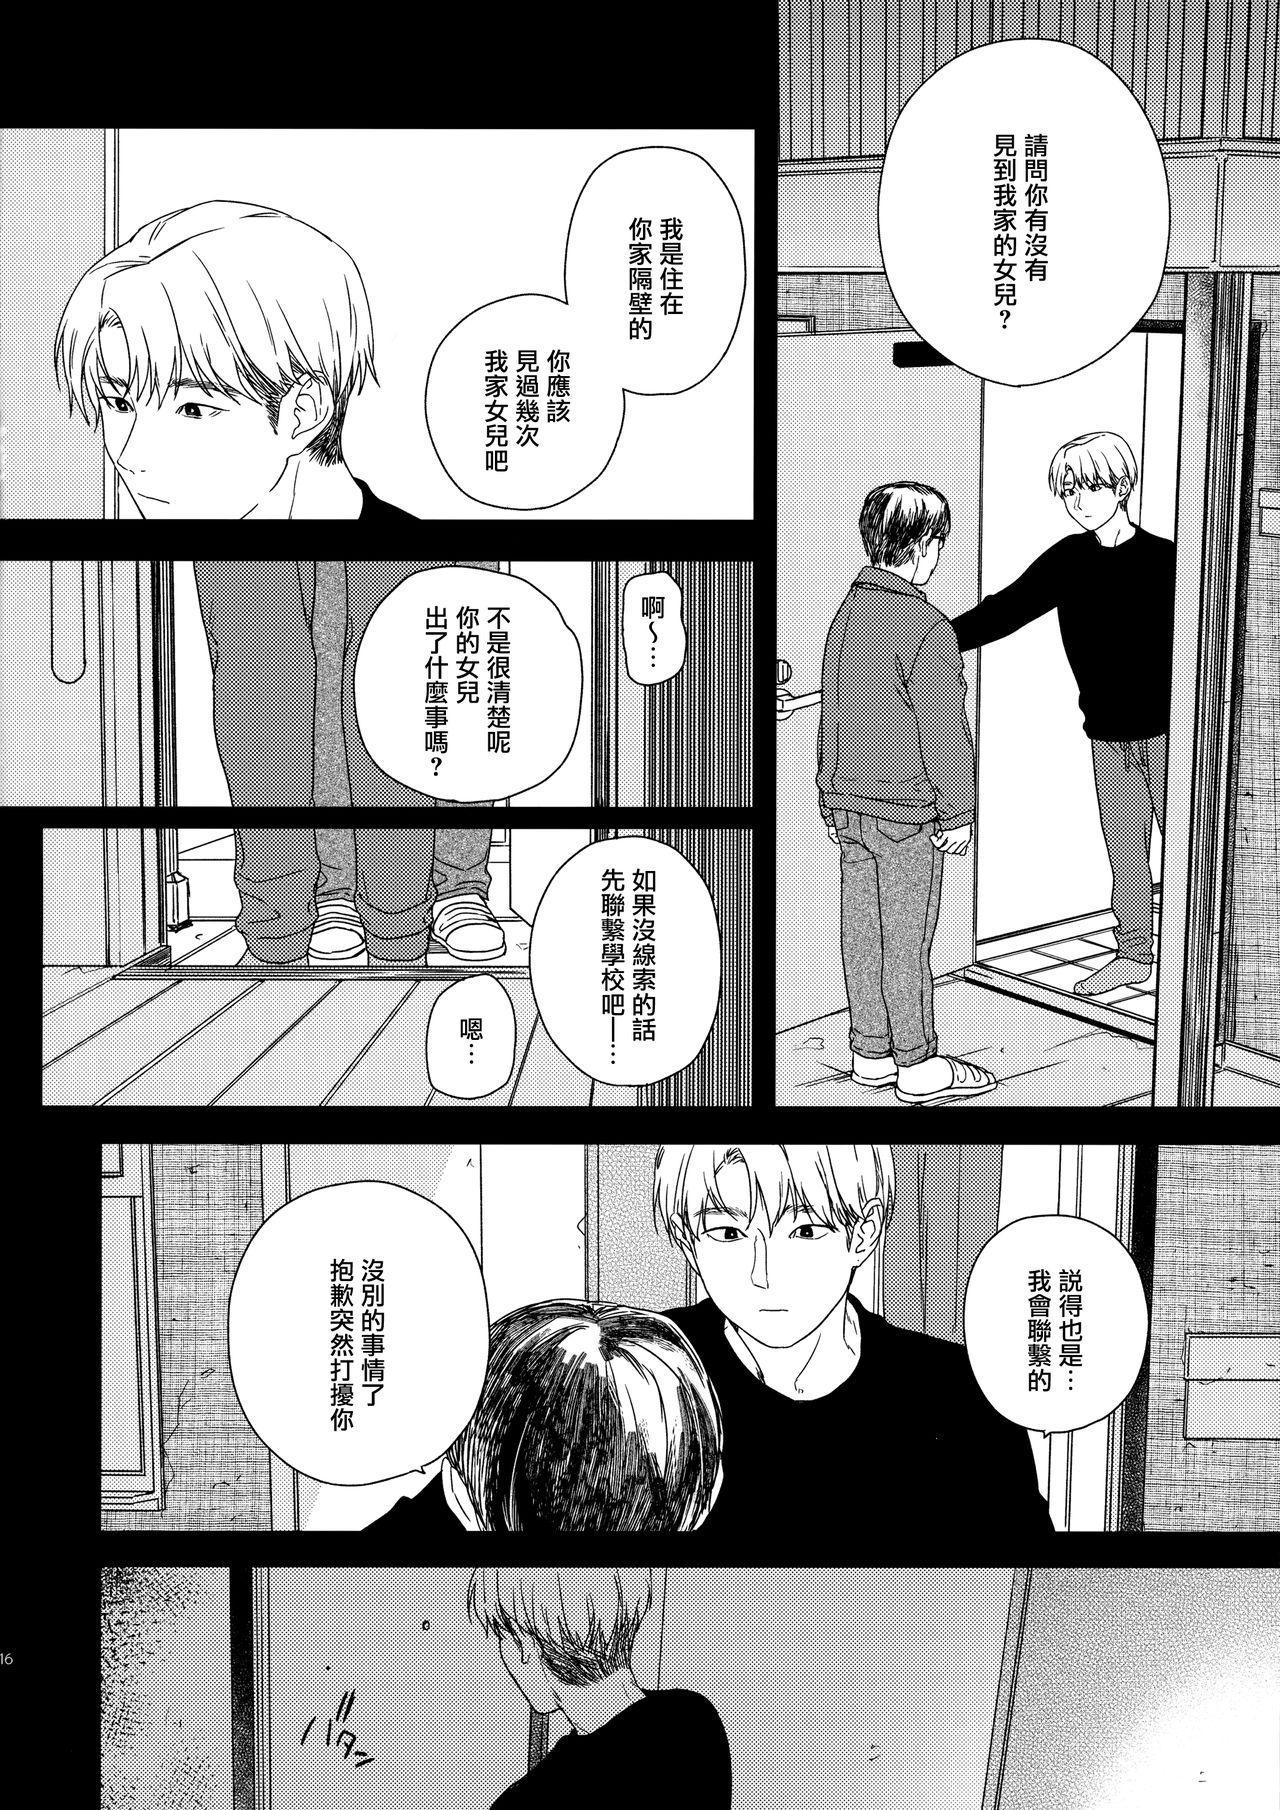 Otonari-san 15